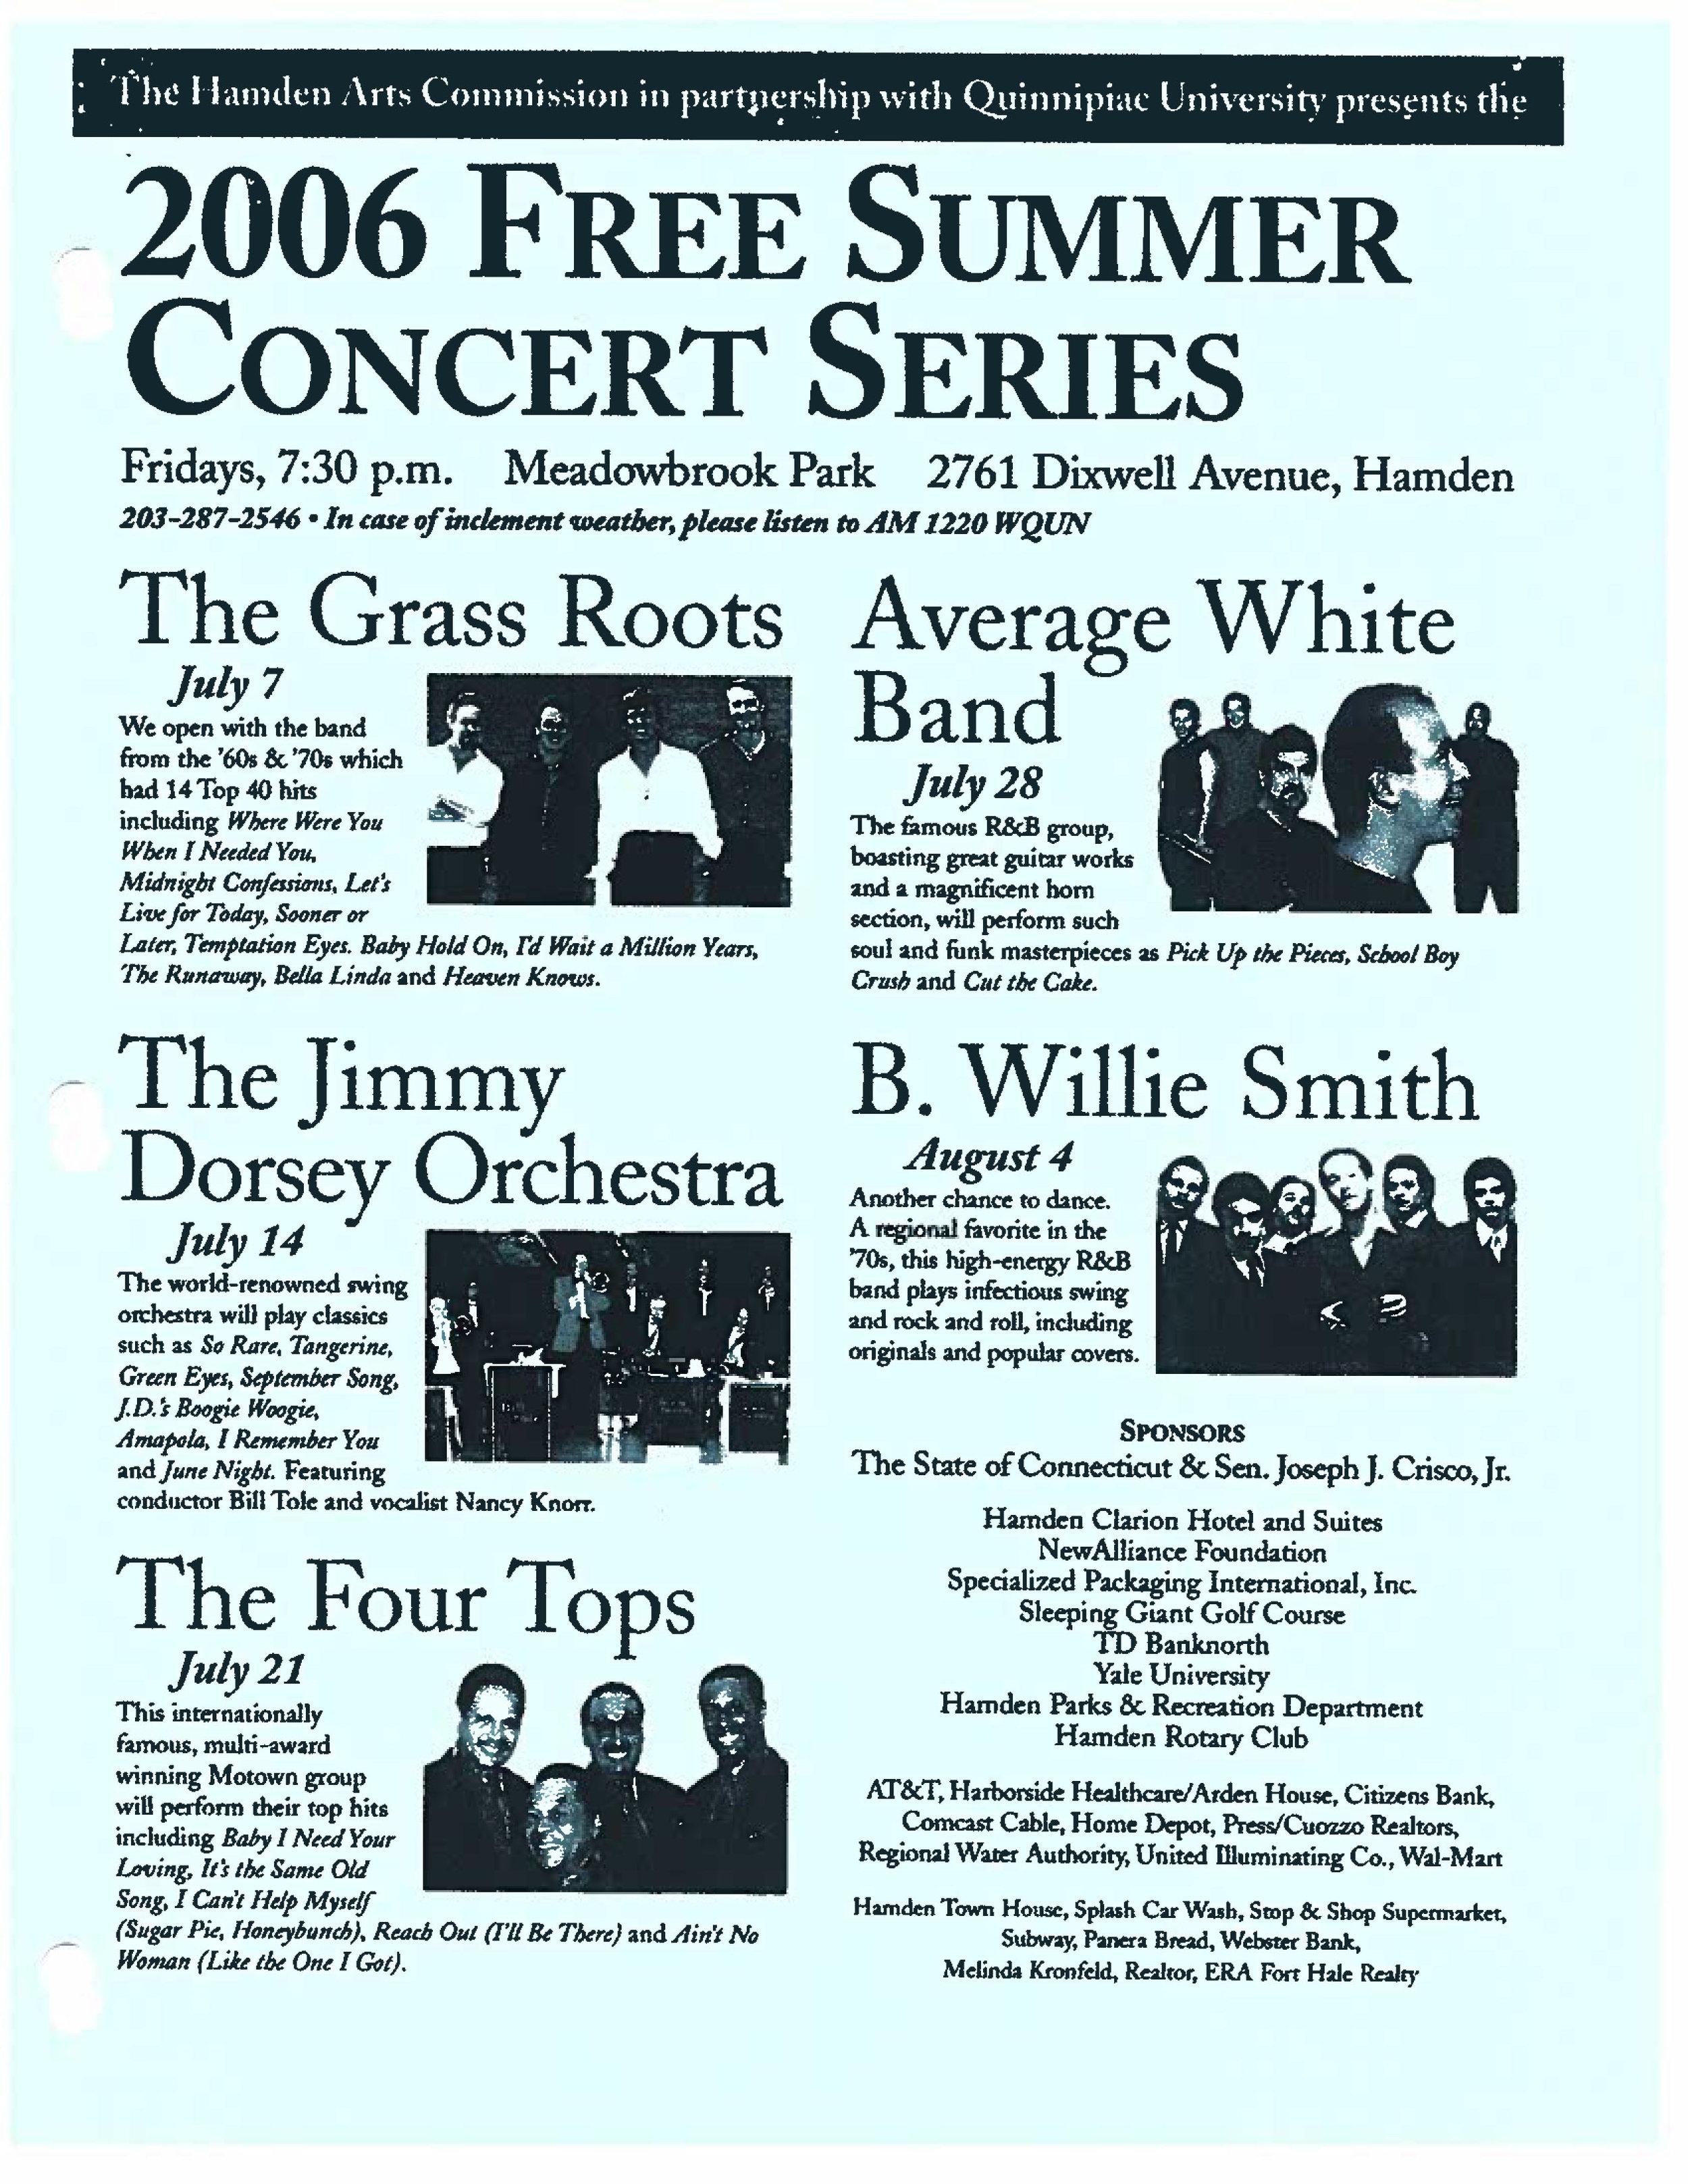 2006_Concerts Program.jpg